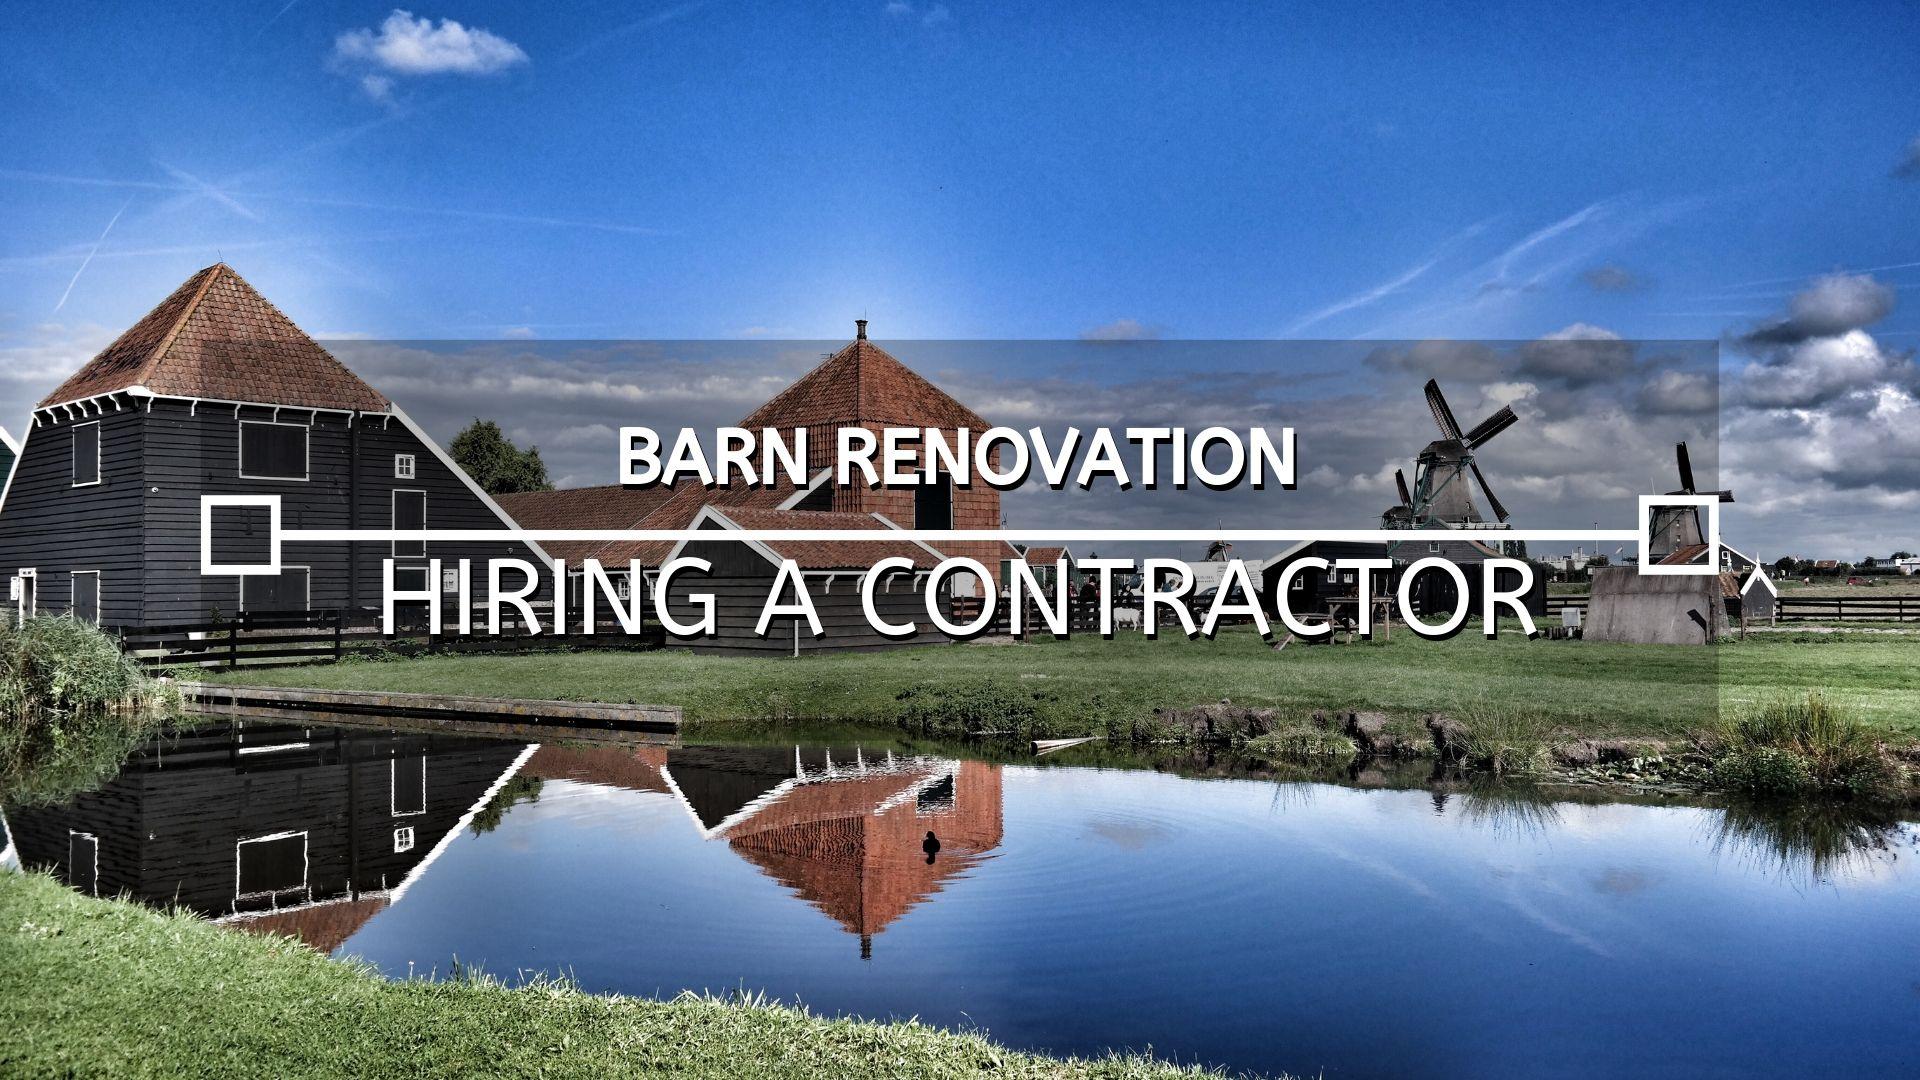 Barn Renovation Hiring a Contractor.jpg